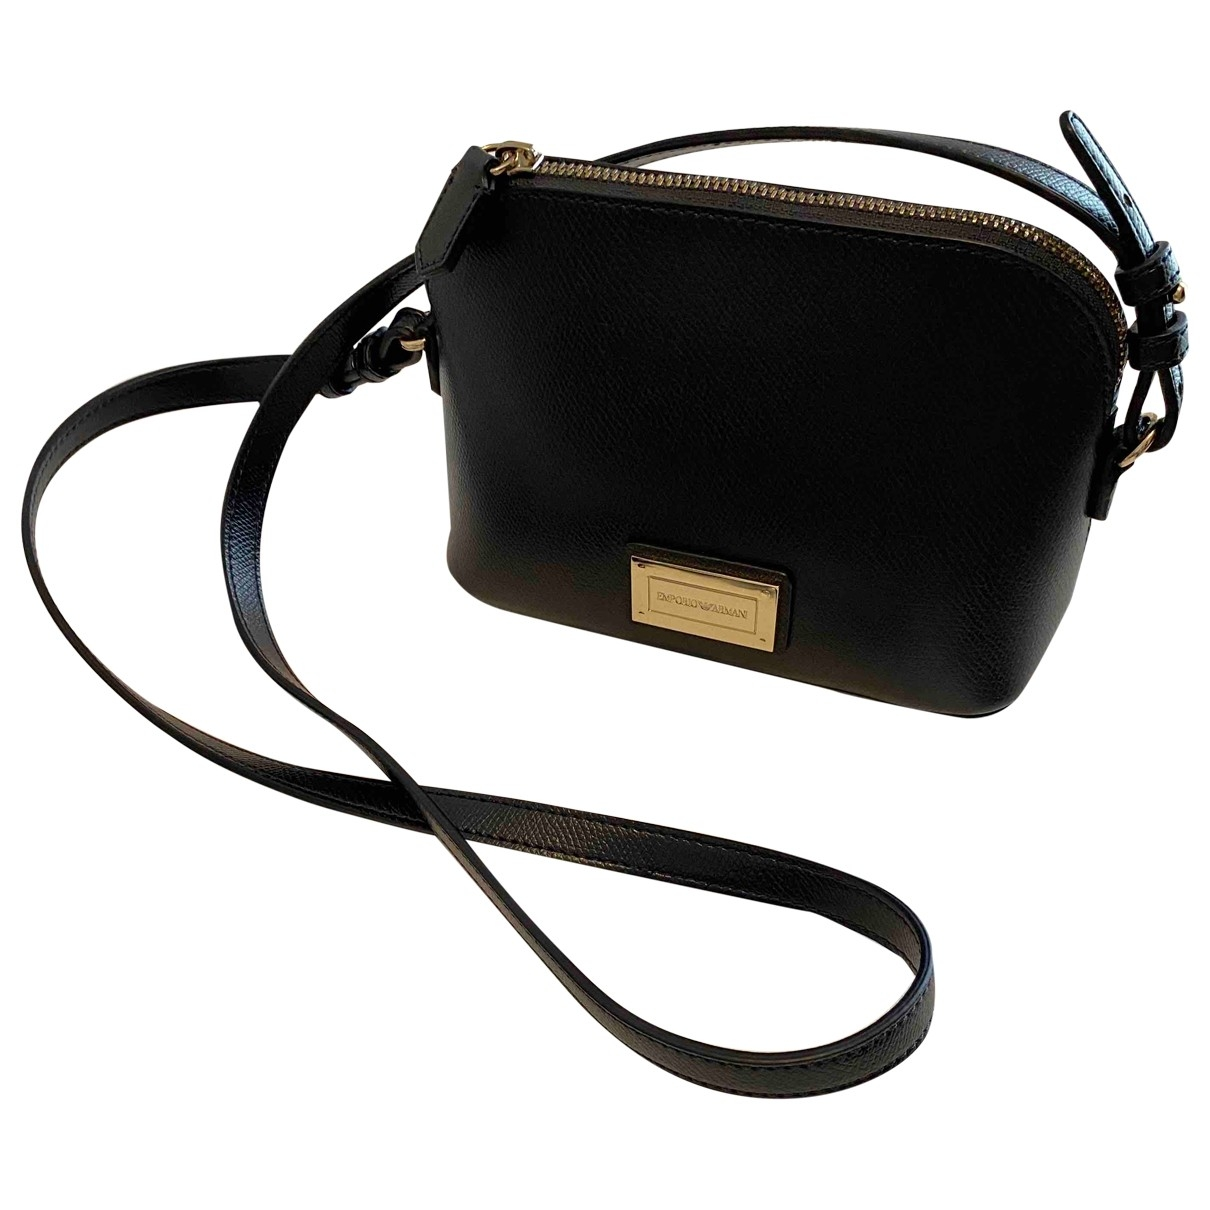 Emporio Armani \N Blue handbag for Women \N